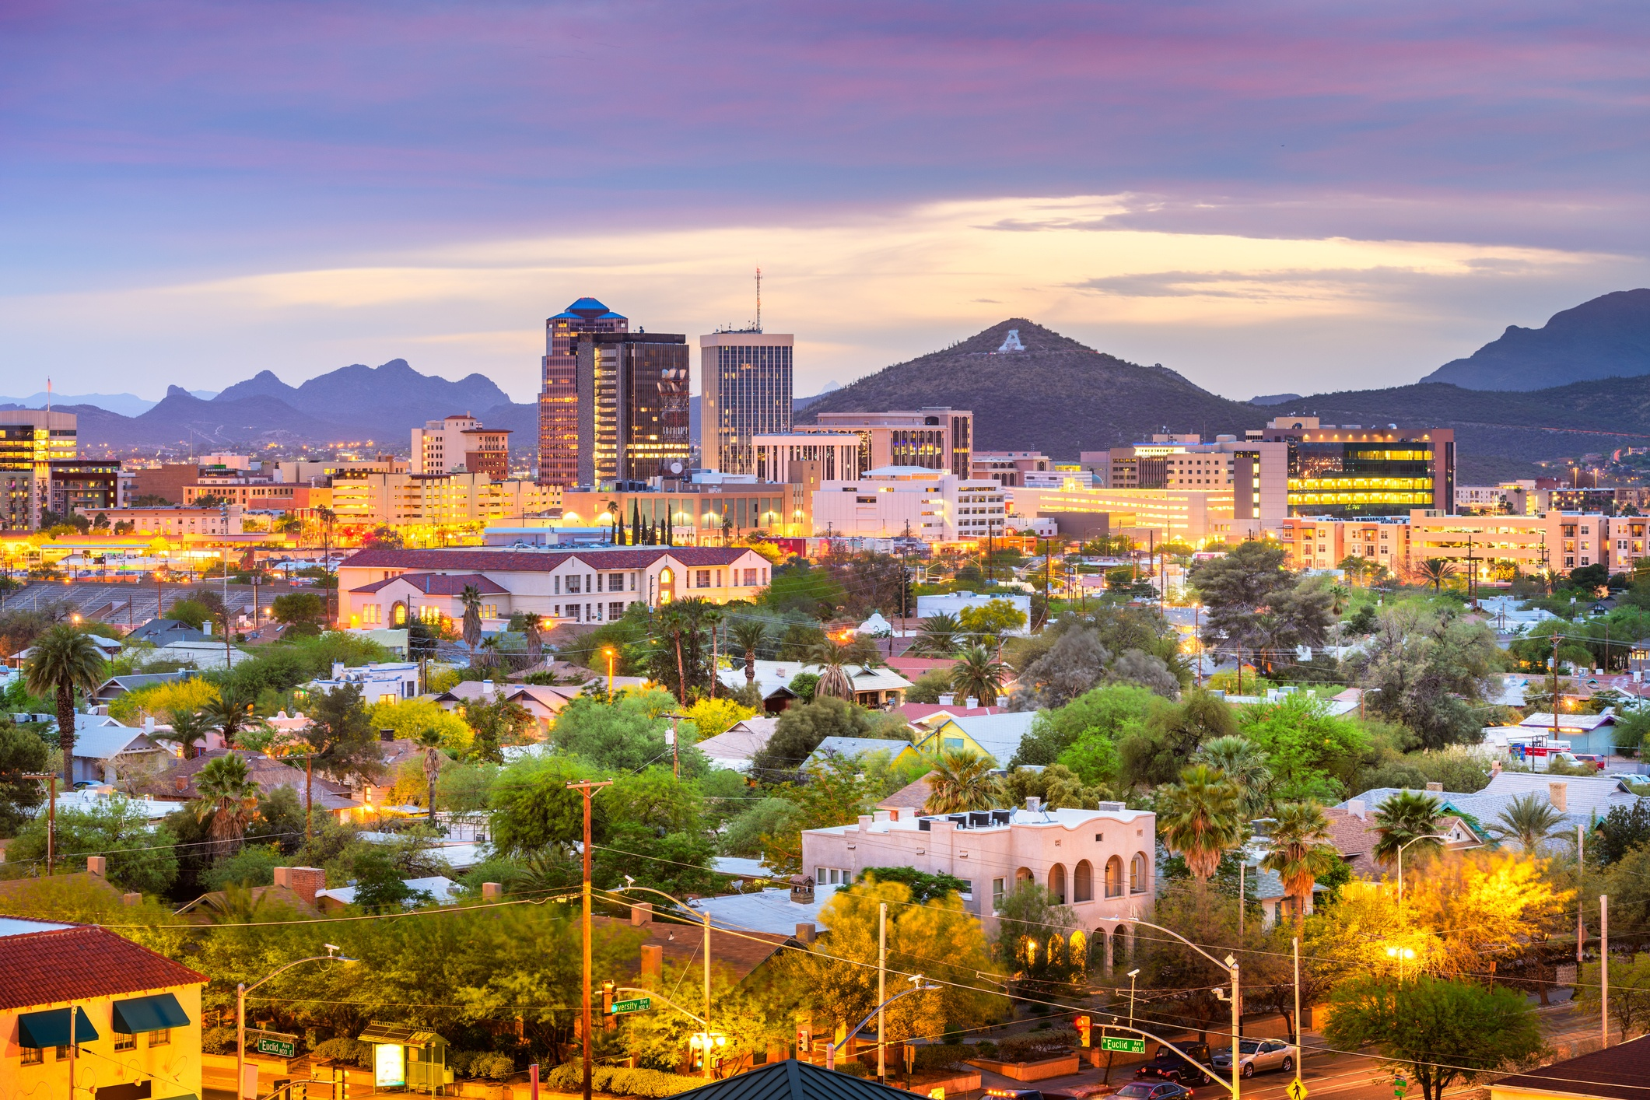 Homes in Tucson AZ